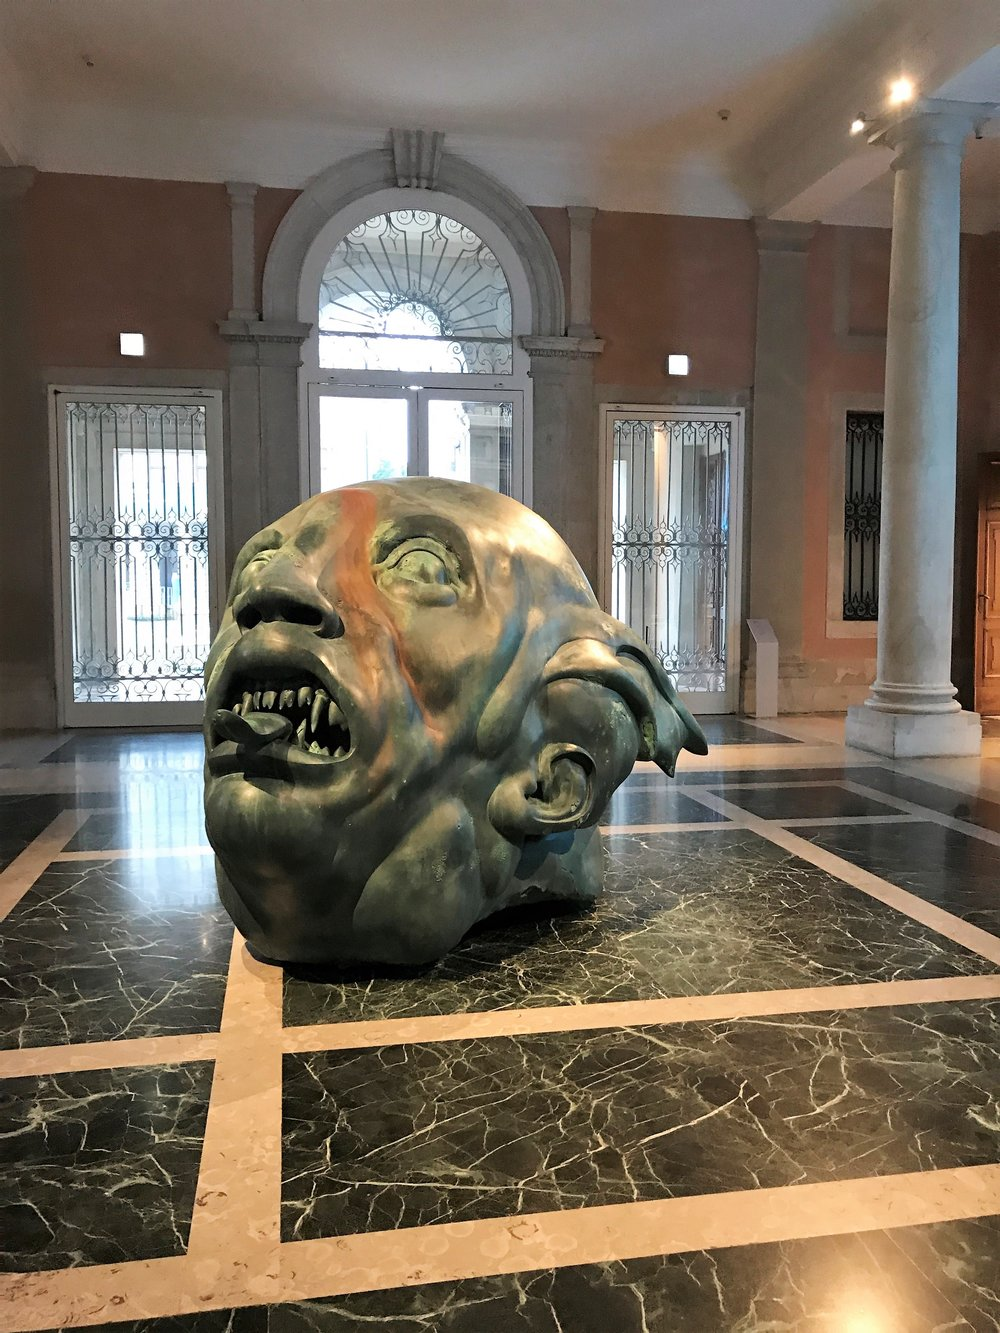 Maria-Brito_Venice-Biennale-68.jpg